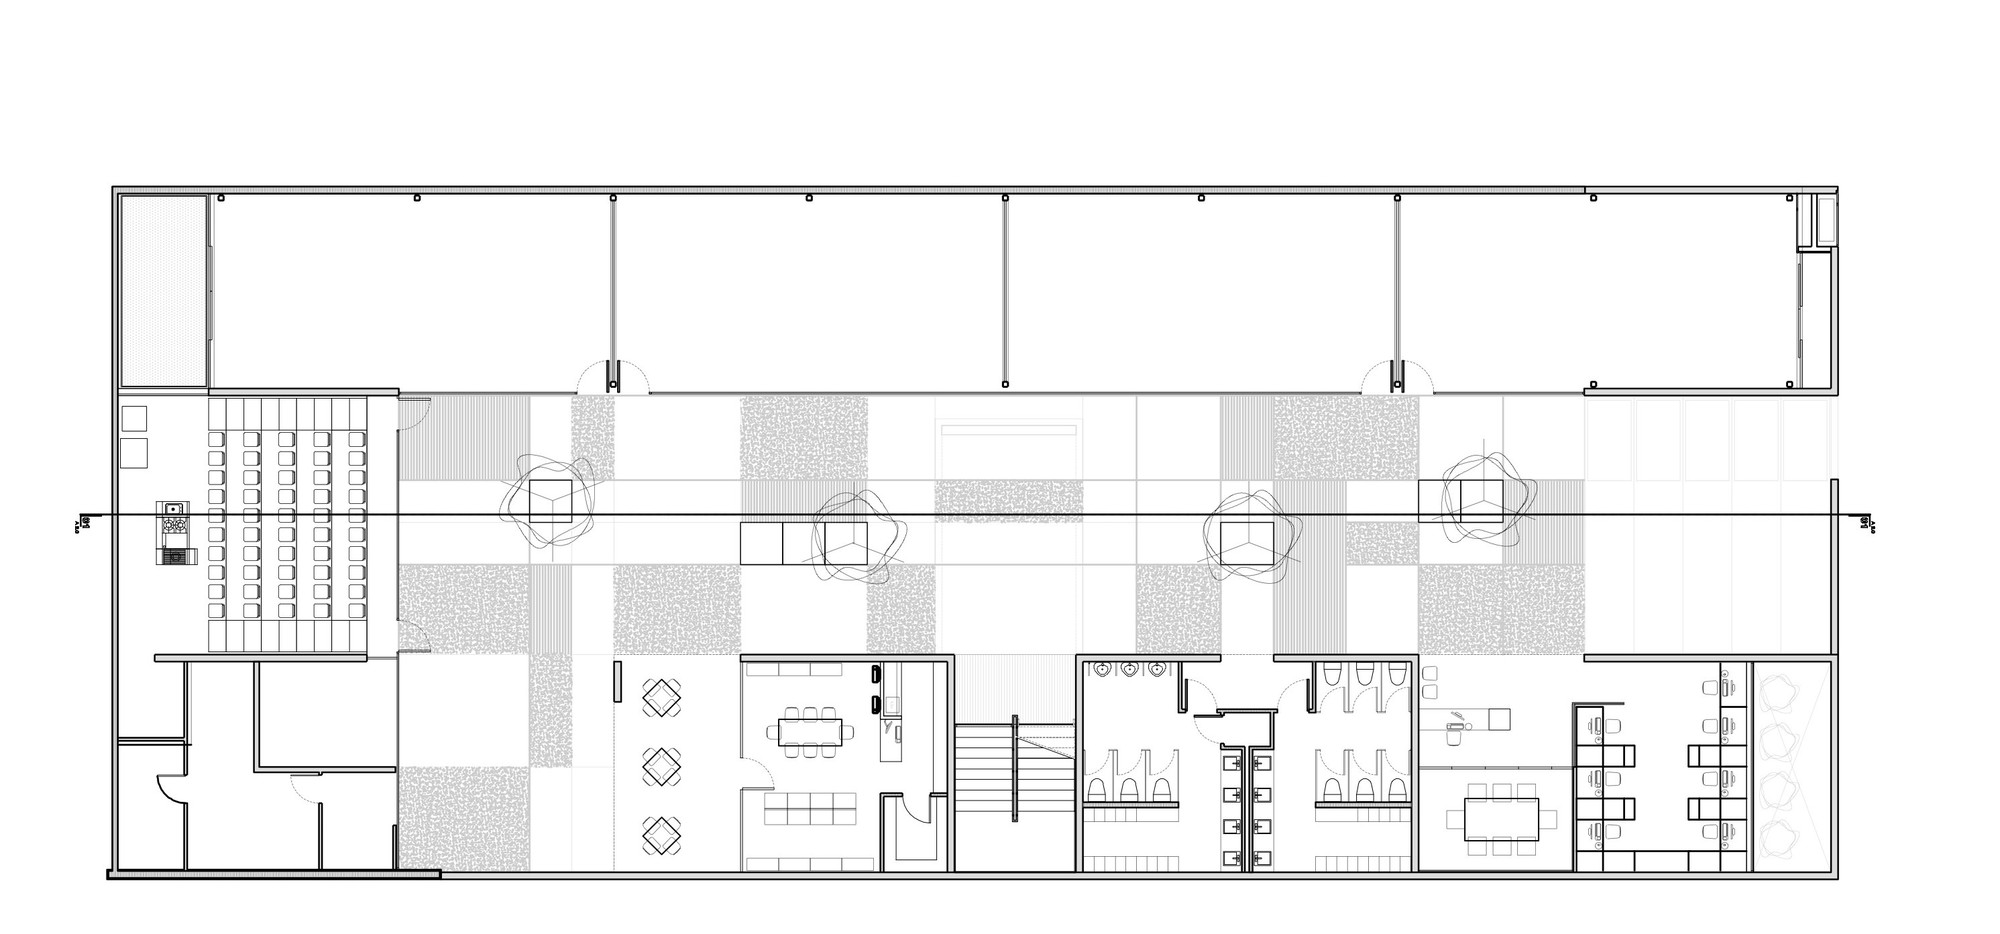 Louis Kahn Floor Plans Gallery Of Culinary Art School Gracia Studio 18